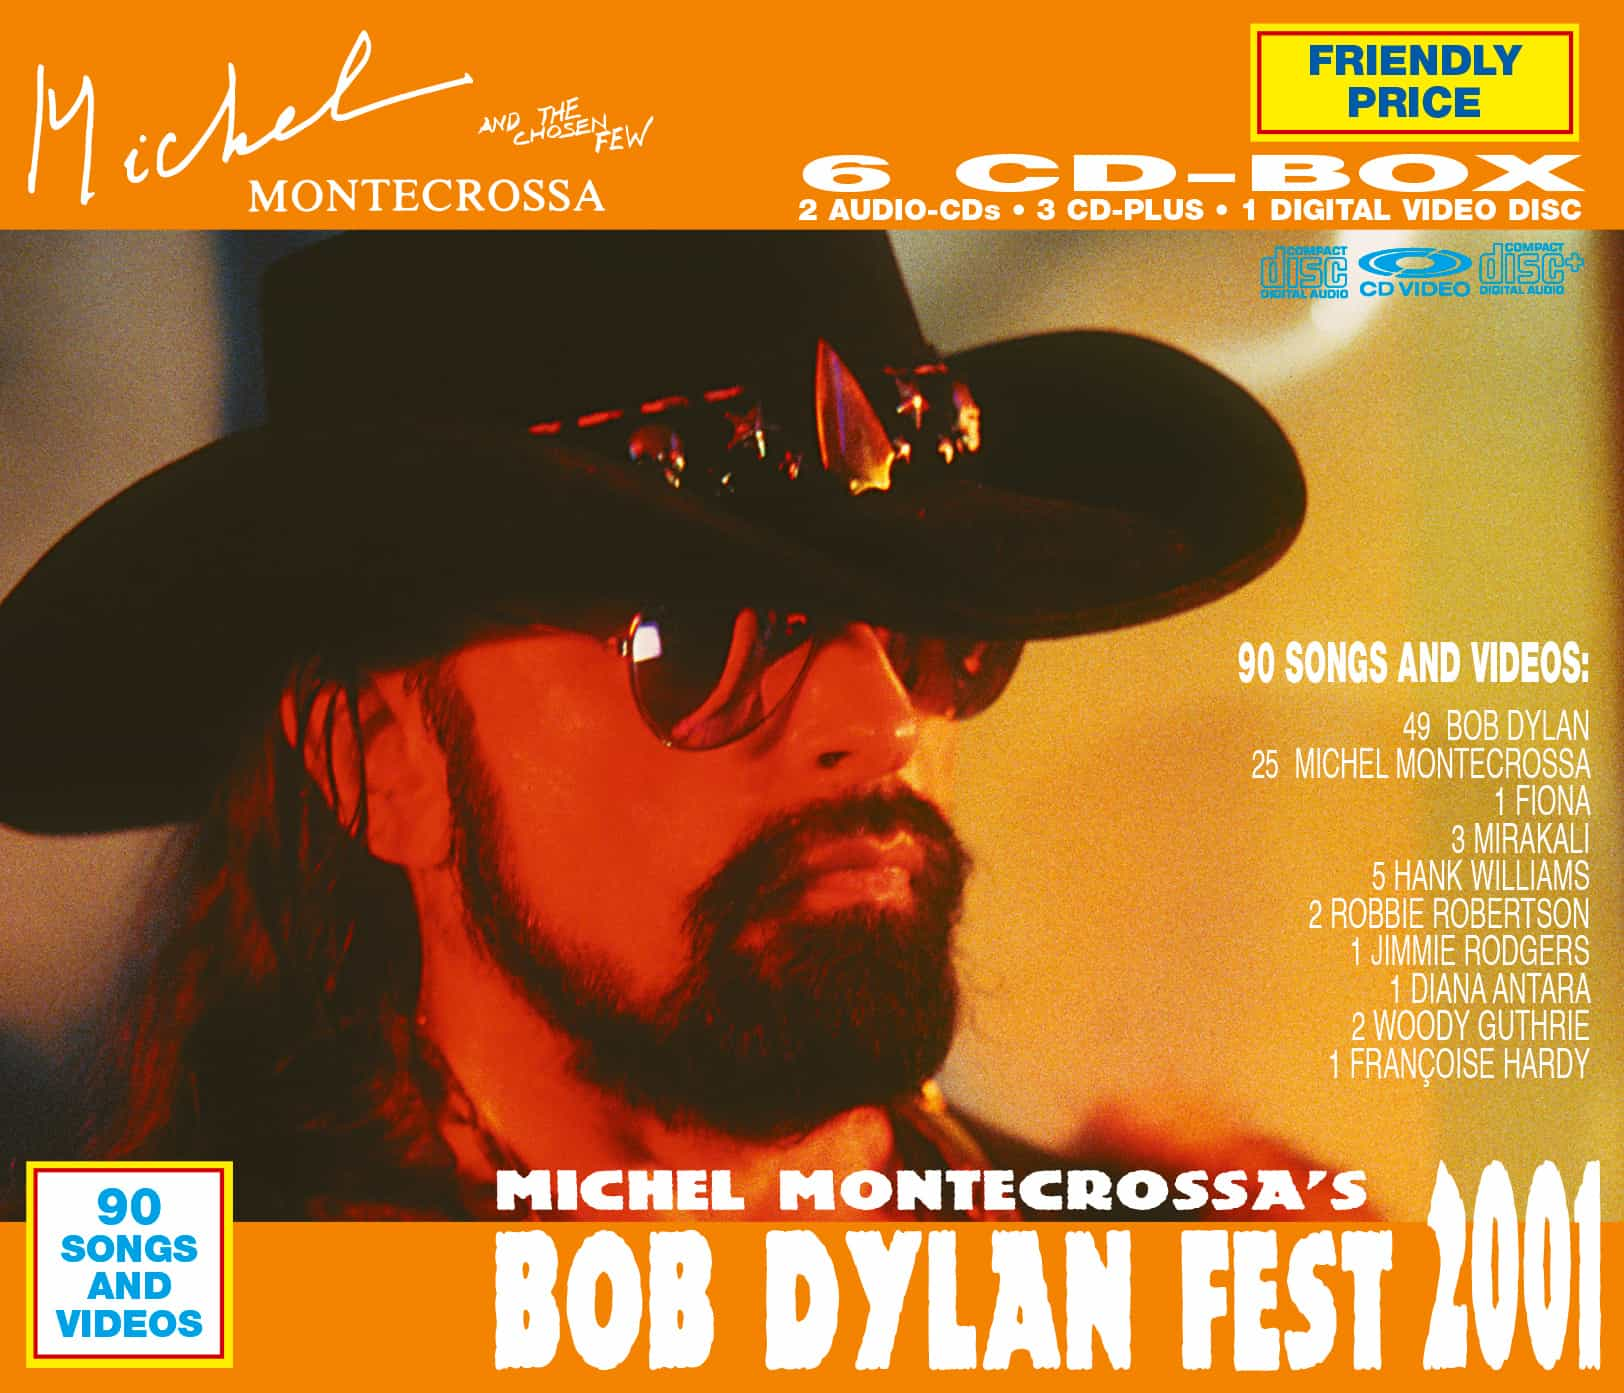 Michel Montecrossa's Bob Dylan Fest 2001